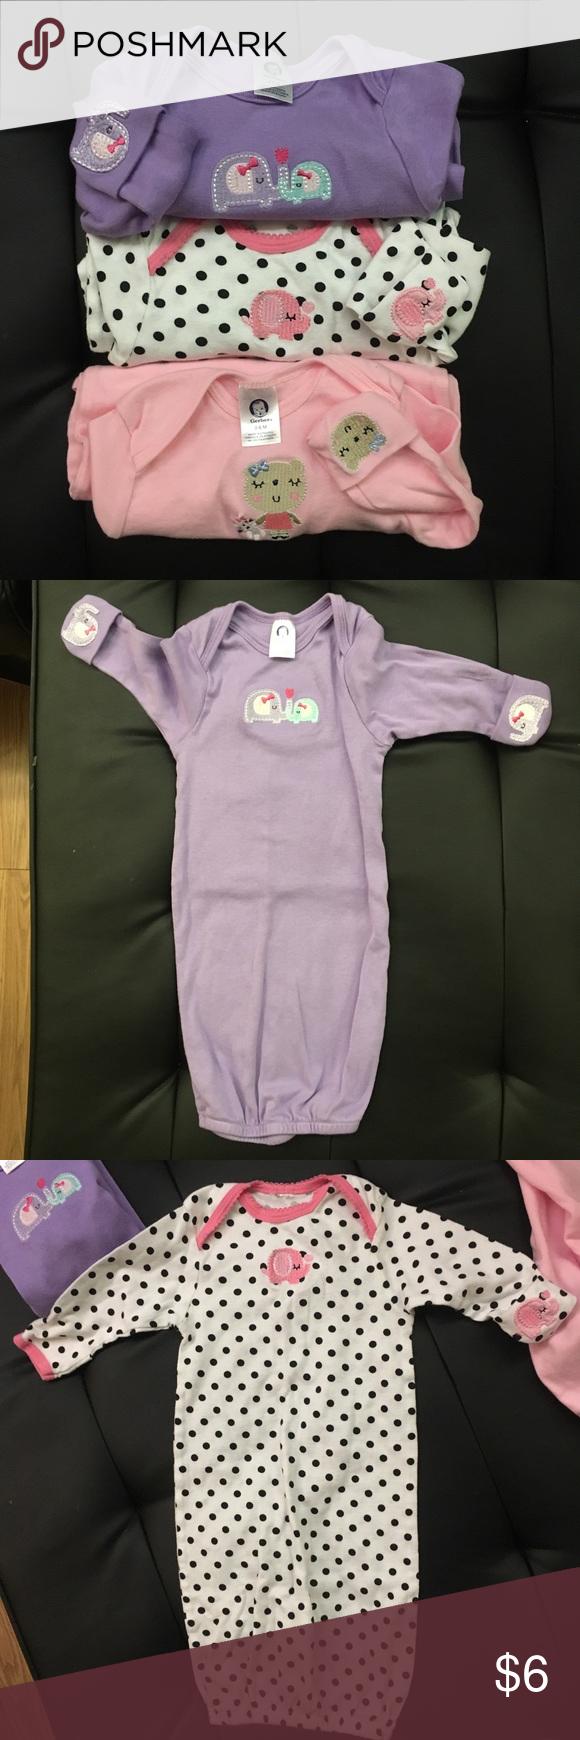 Sleep gown bundle 0-6 month bundle of Gerber sleep gowns. All soft ...